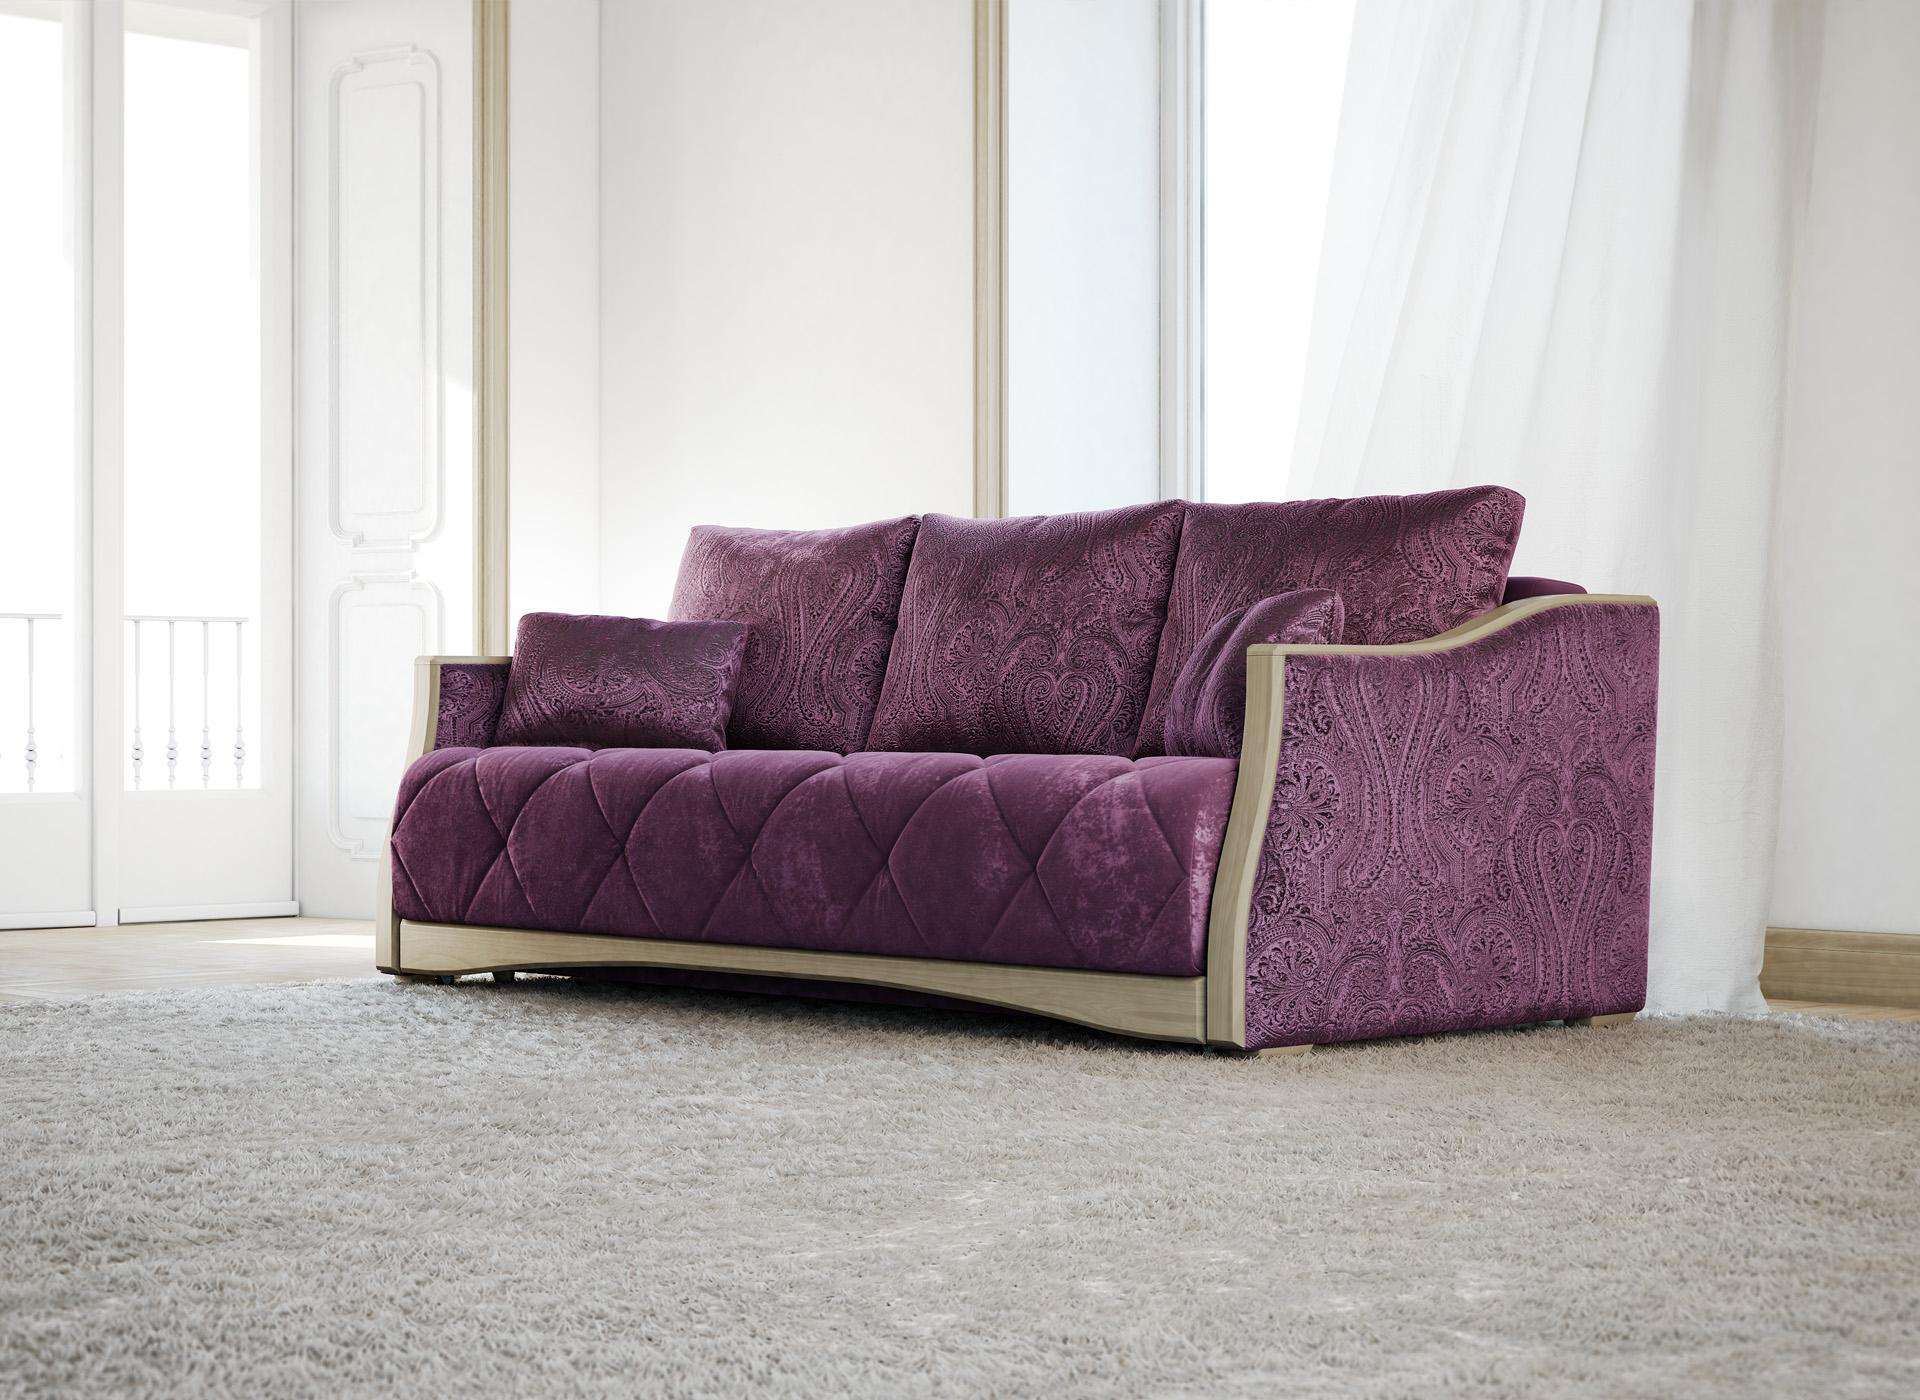 Диван-канапе фиолетового цвета